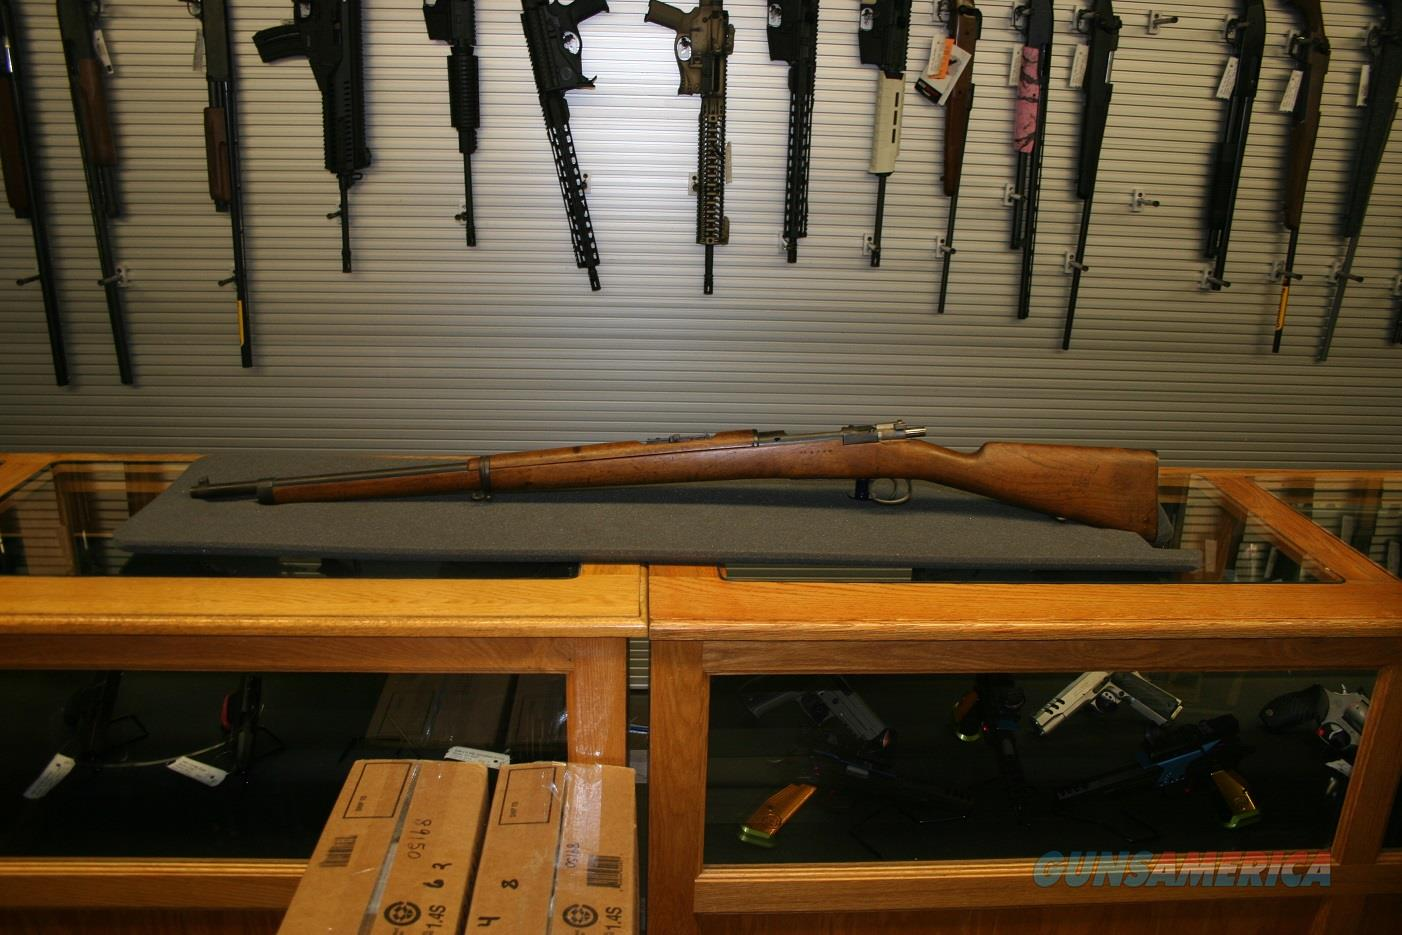 Fabria DeArmas Oviedo 1928 7mm Mauser   Guns > Rifles > Mauser Rifles > Spanish